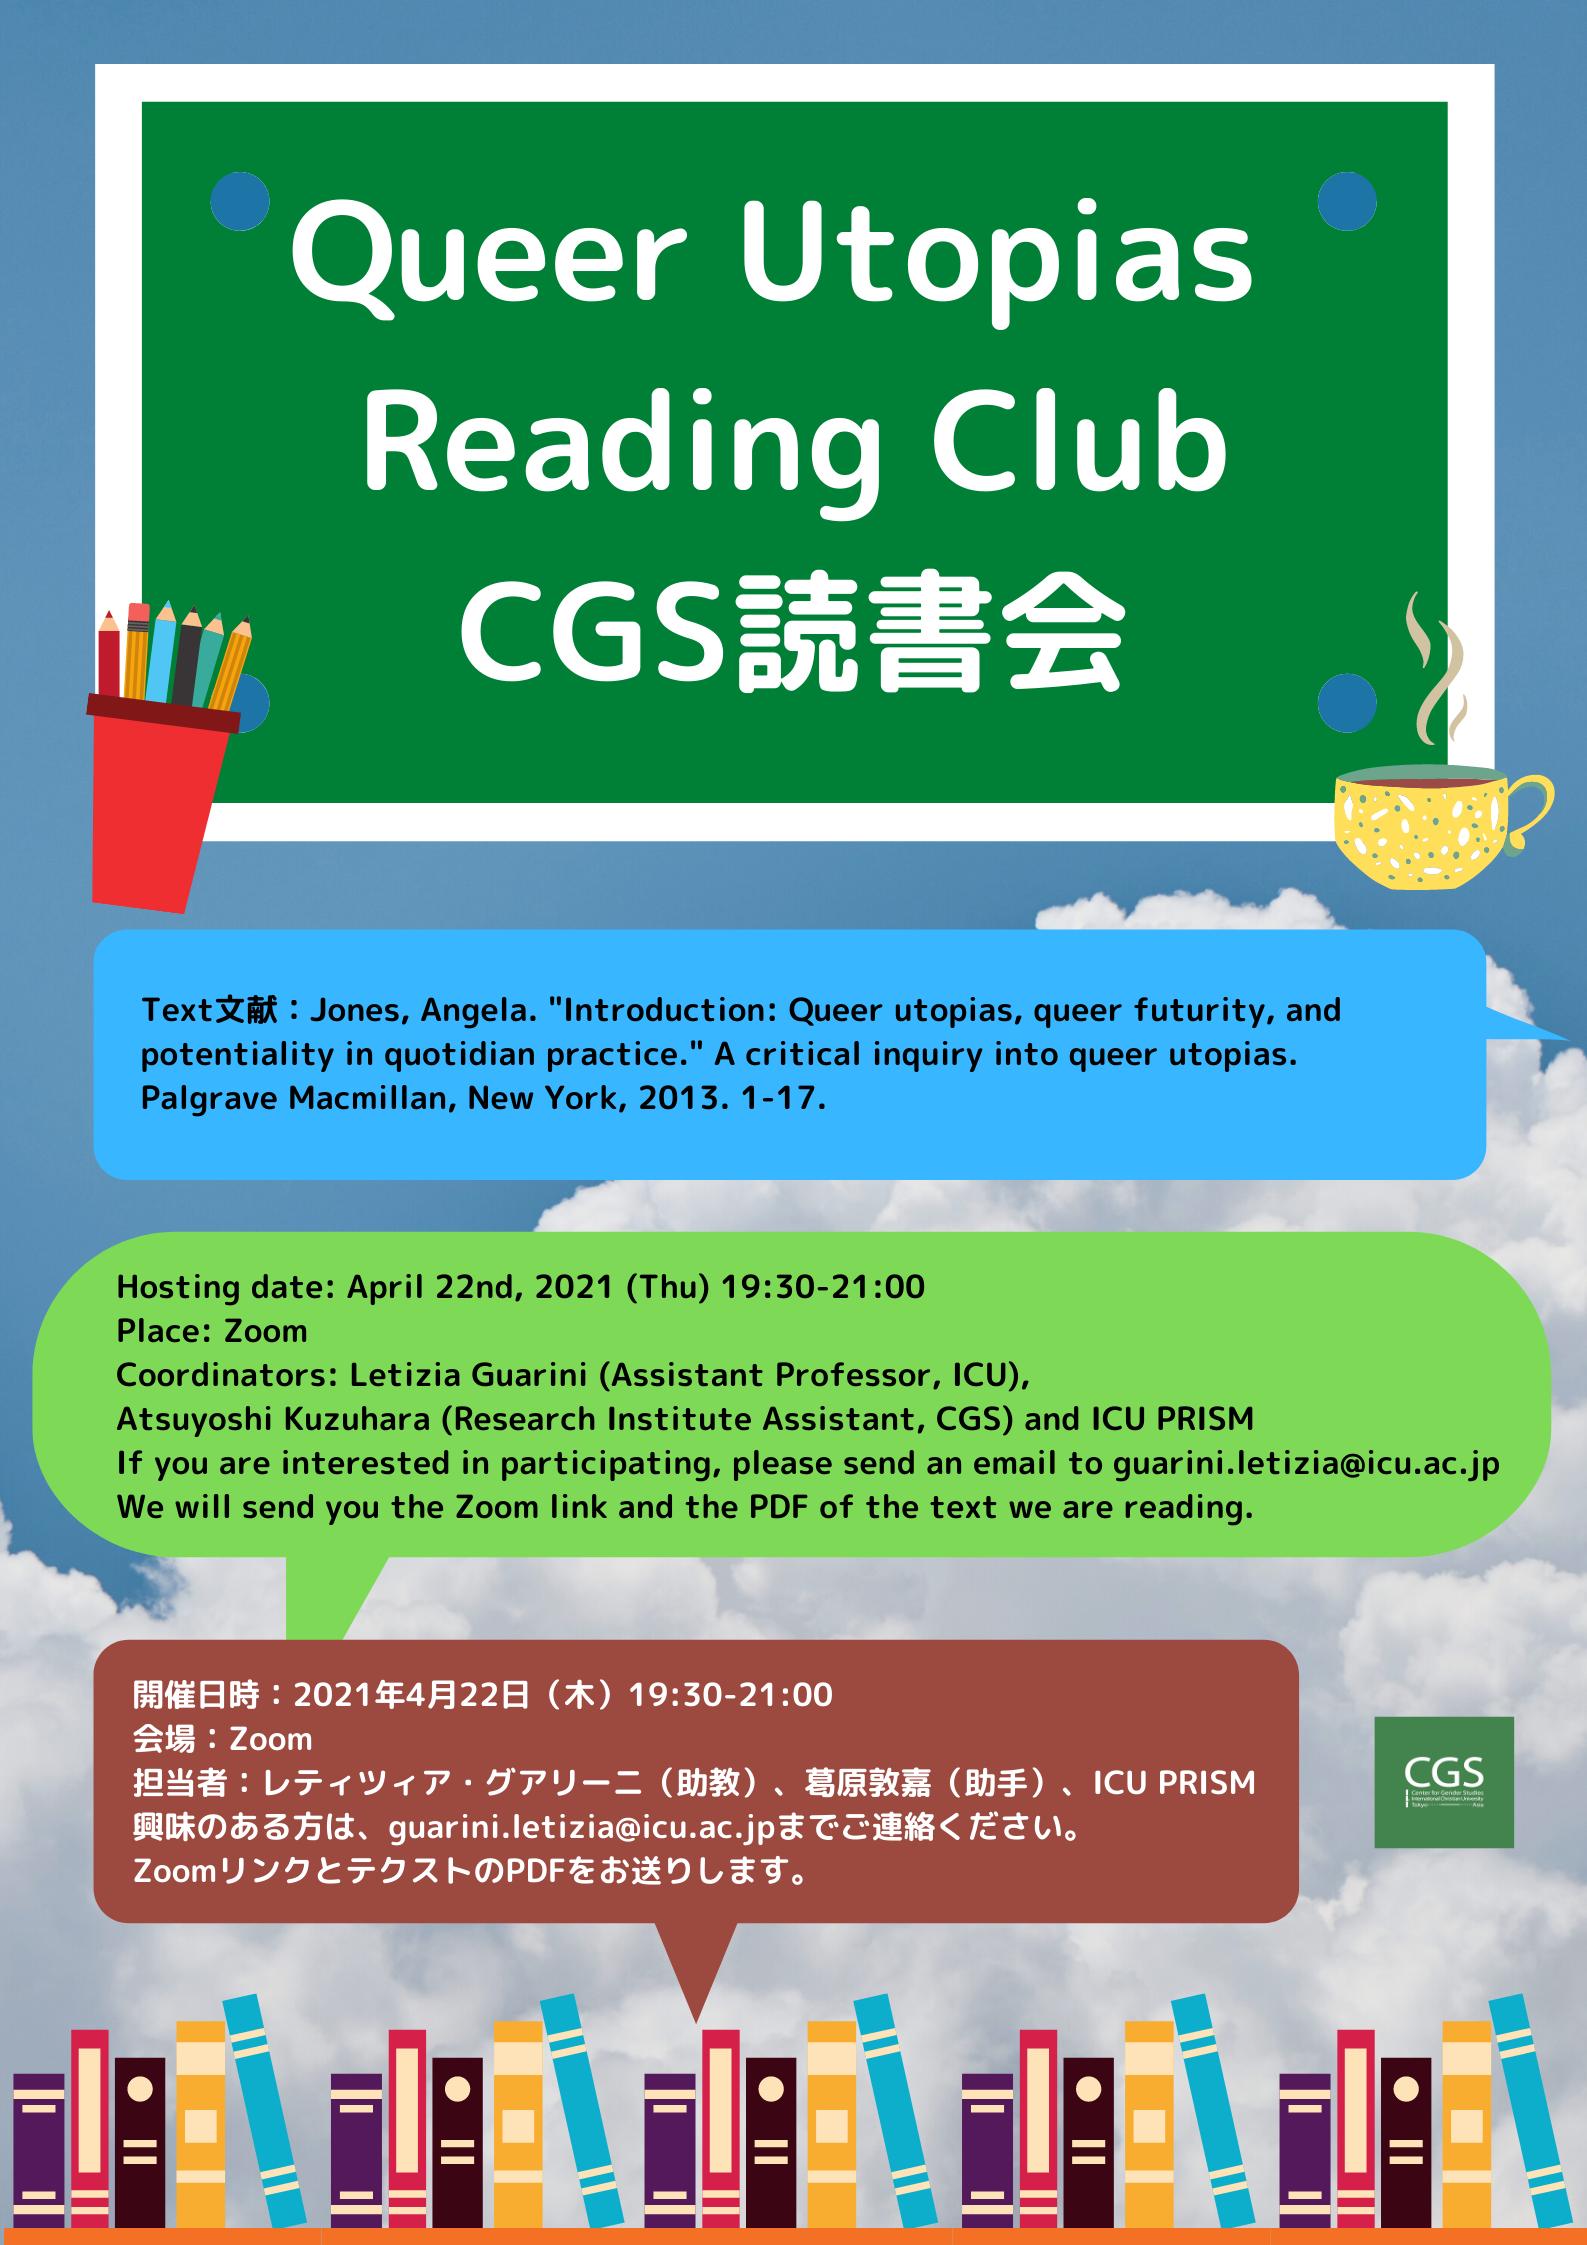 CGS Reading Club.png